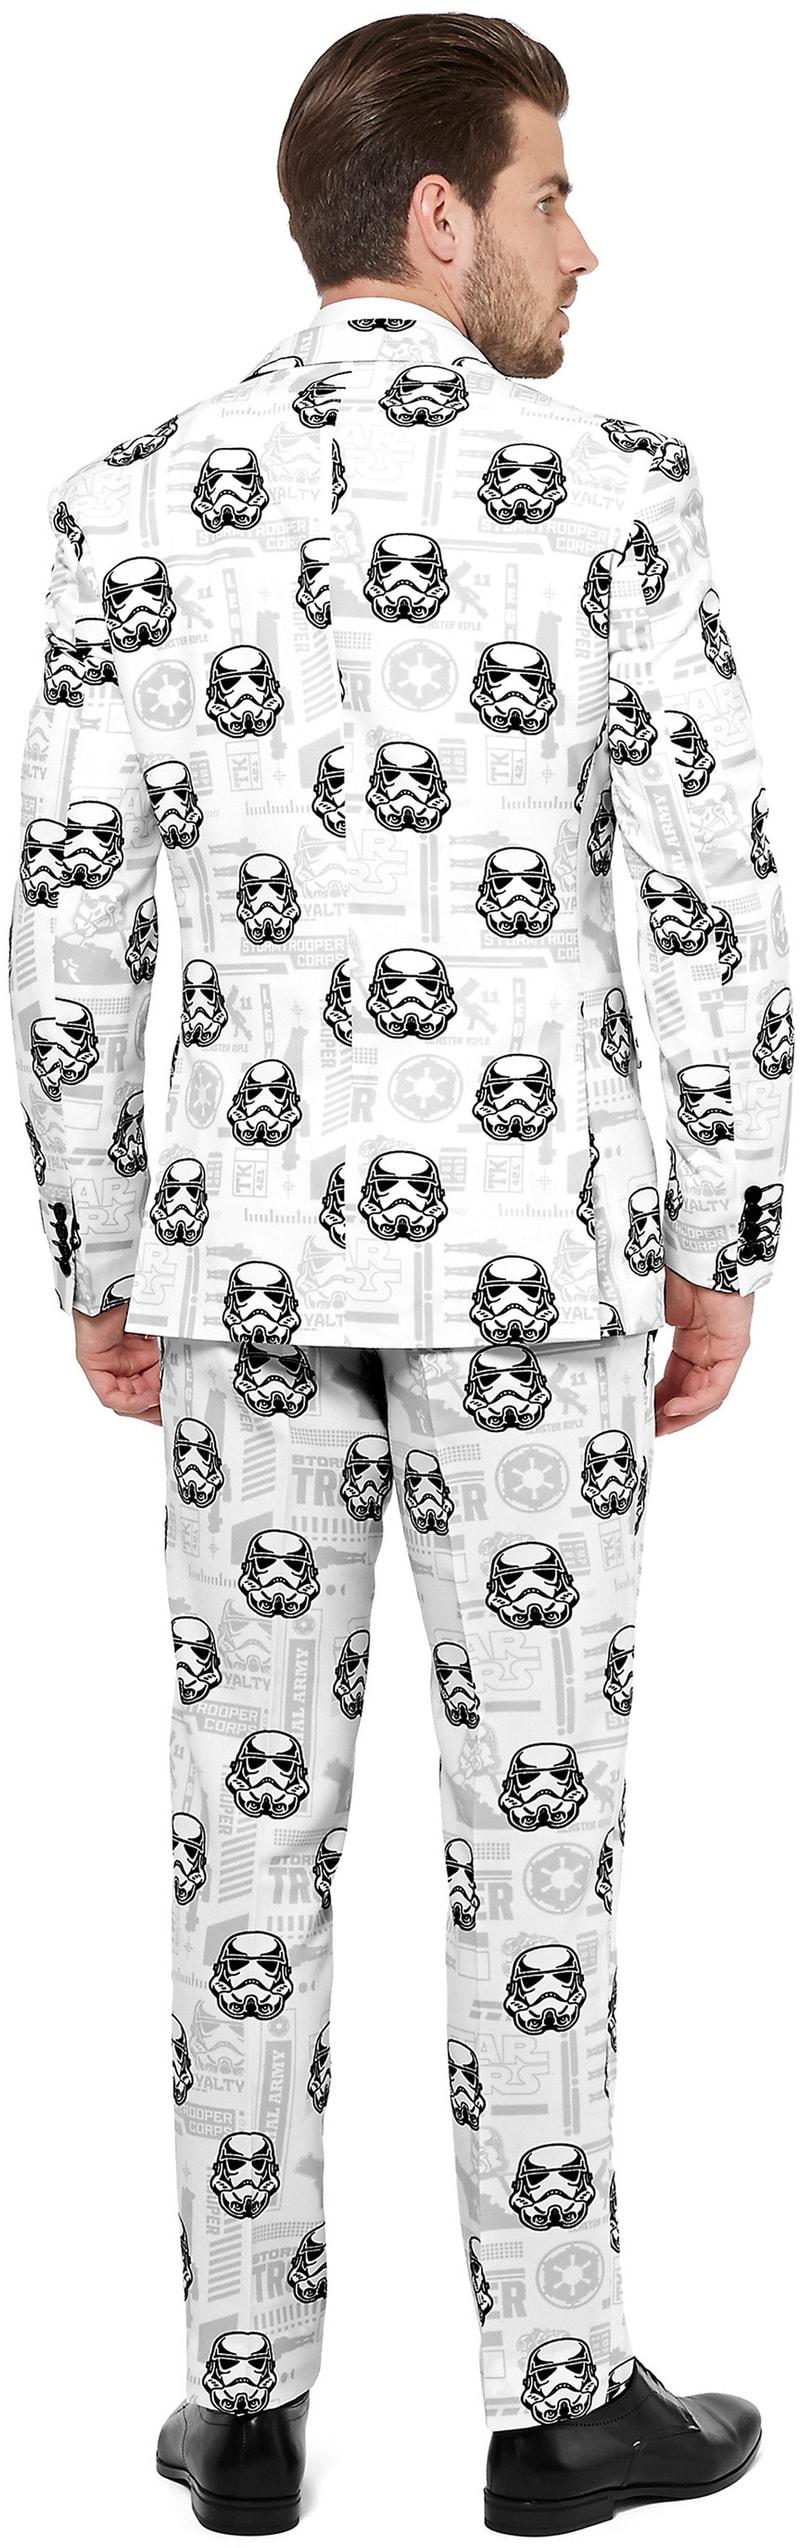 OppoSuits Stormtrooper Kostuum foto 1